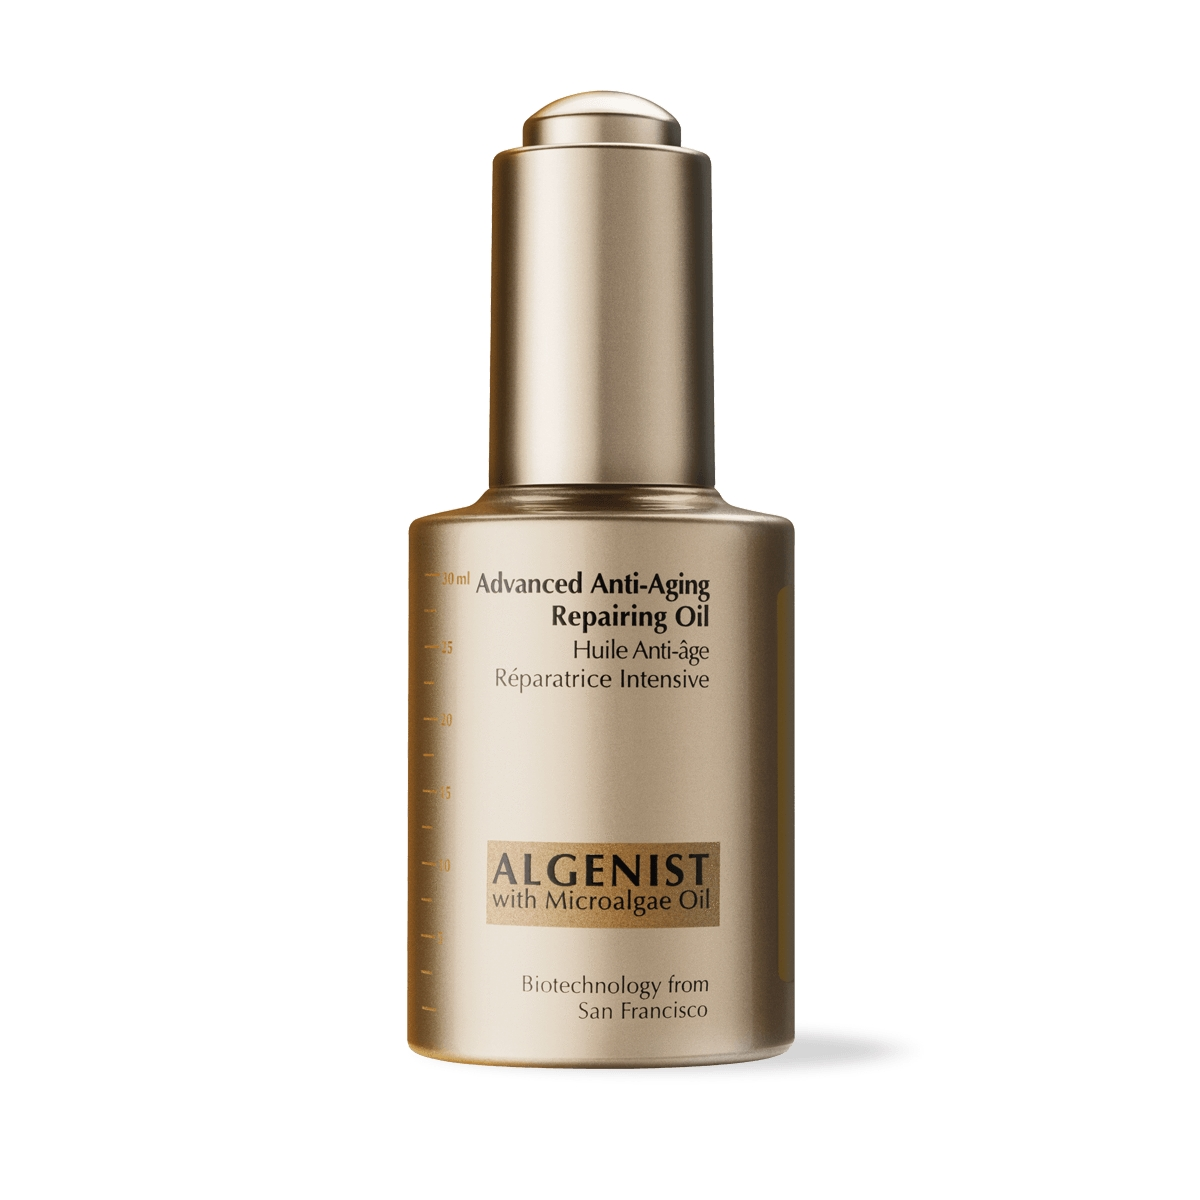 Algenist Advanced Anti-Aging Repairing Oil, 30 ml